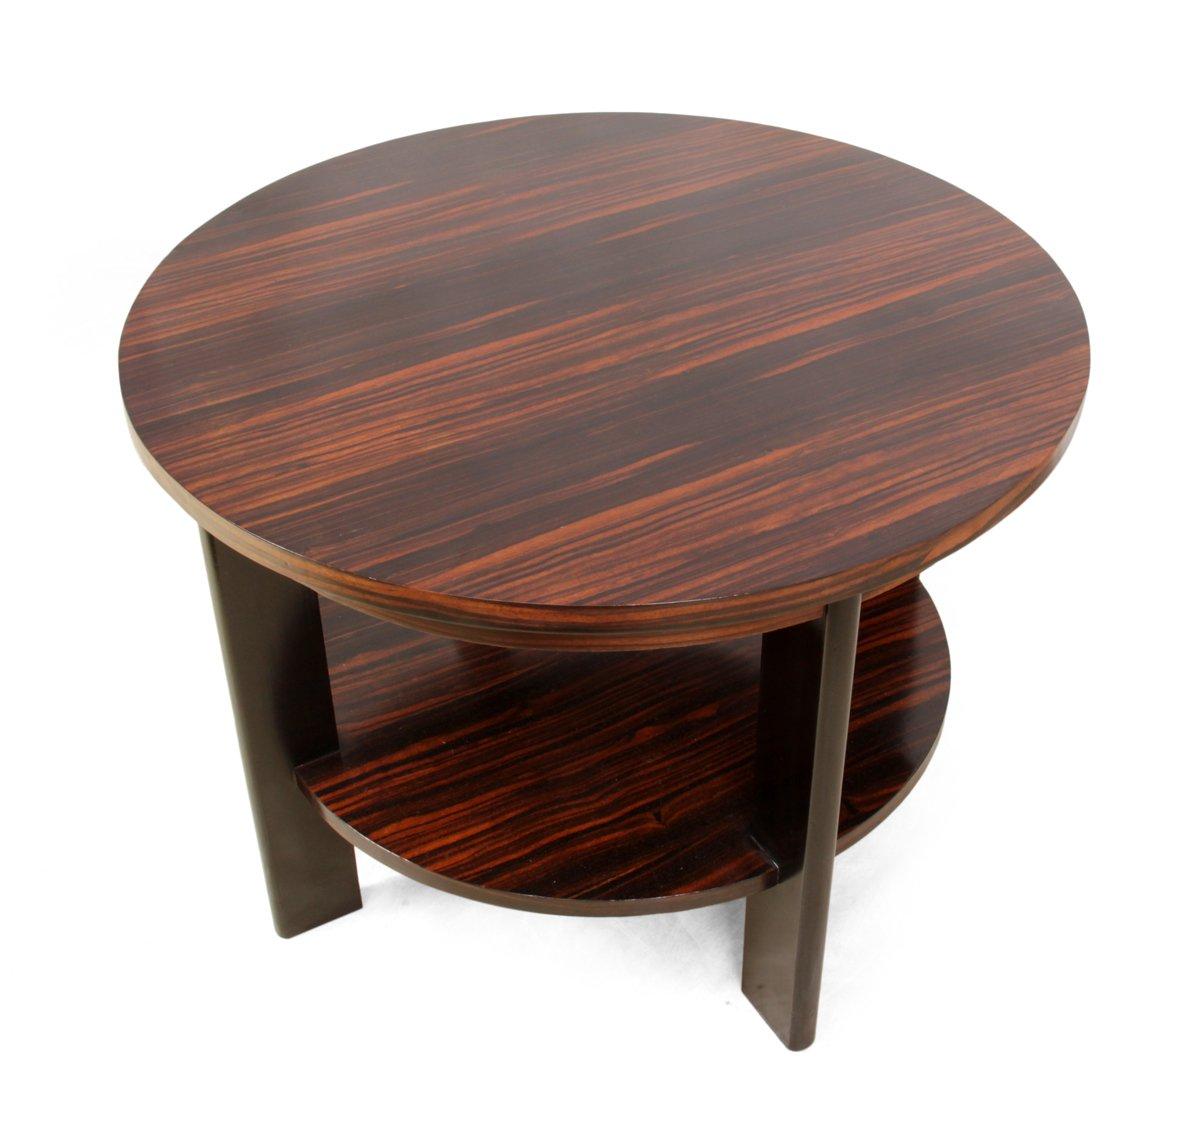 Art deco macassar ebony coffee table 1930s for sale at pamono for Art deco coffee table